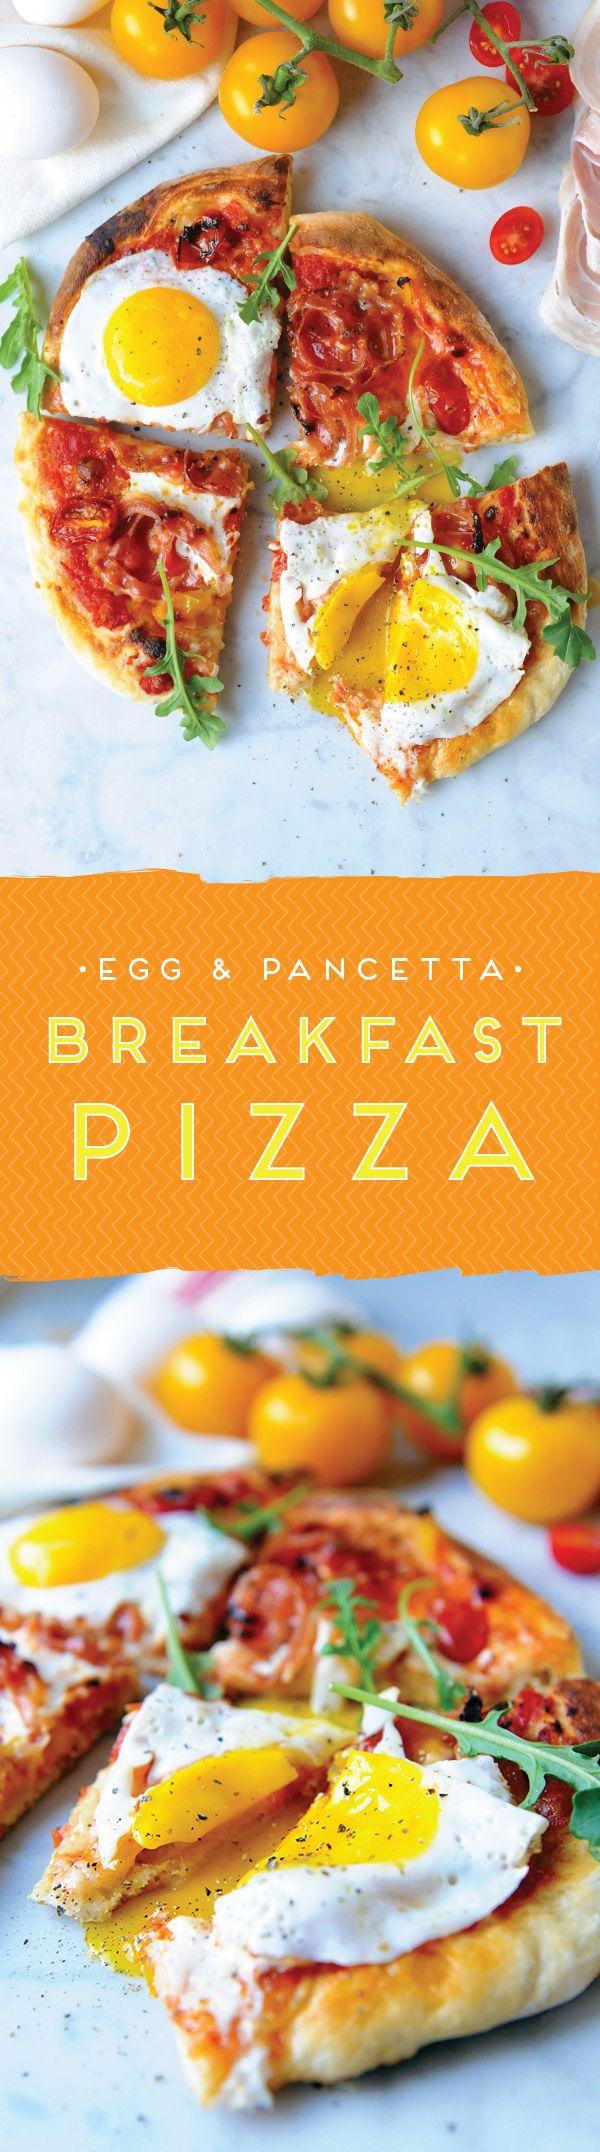 Egg & Pancetta Breakfast Pizza | Wake up, Homemade and We